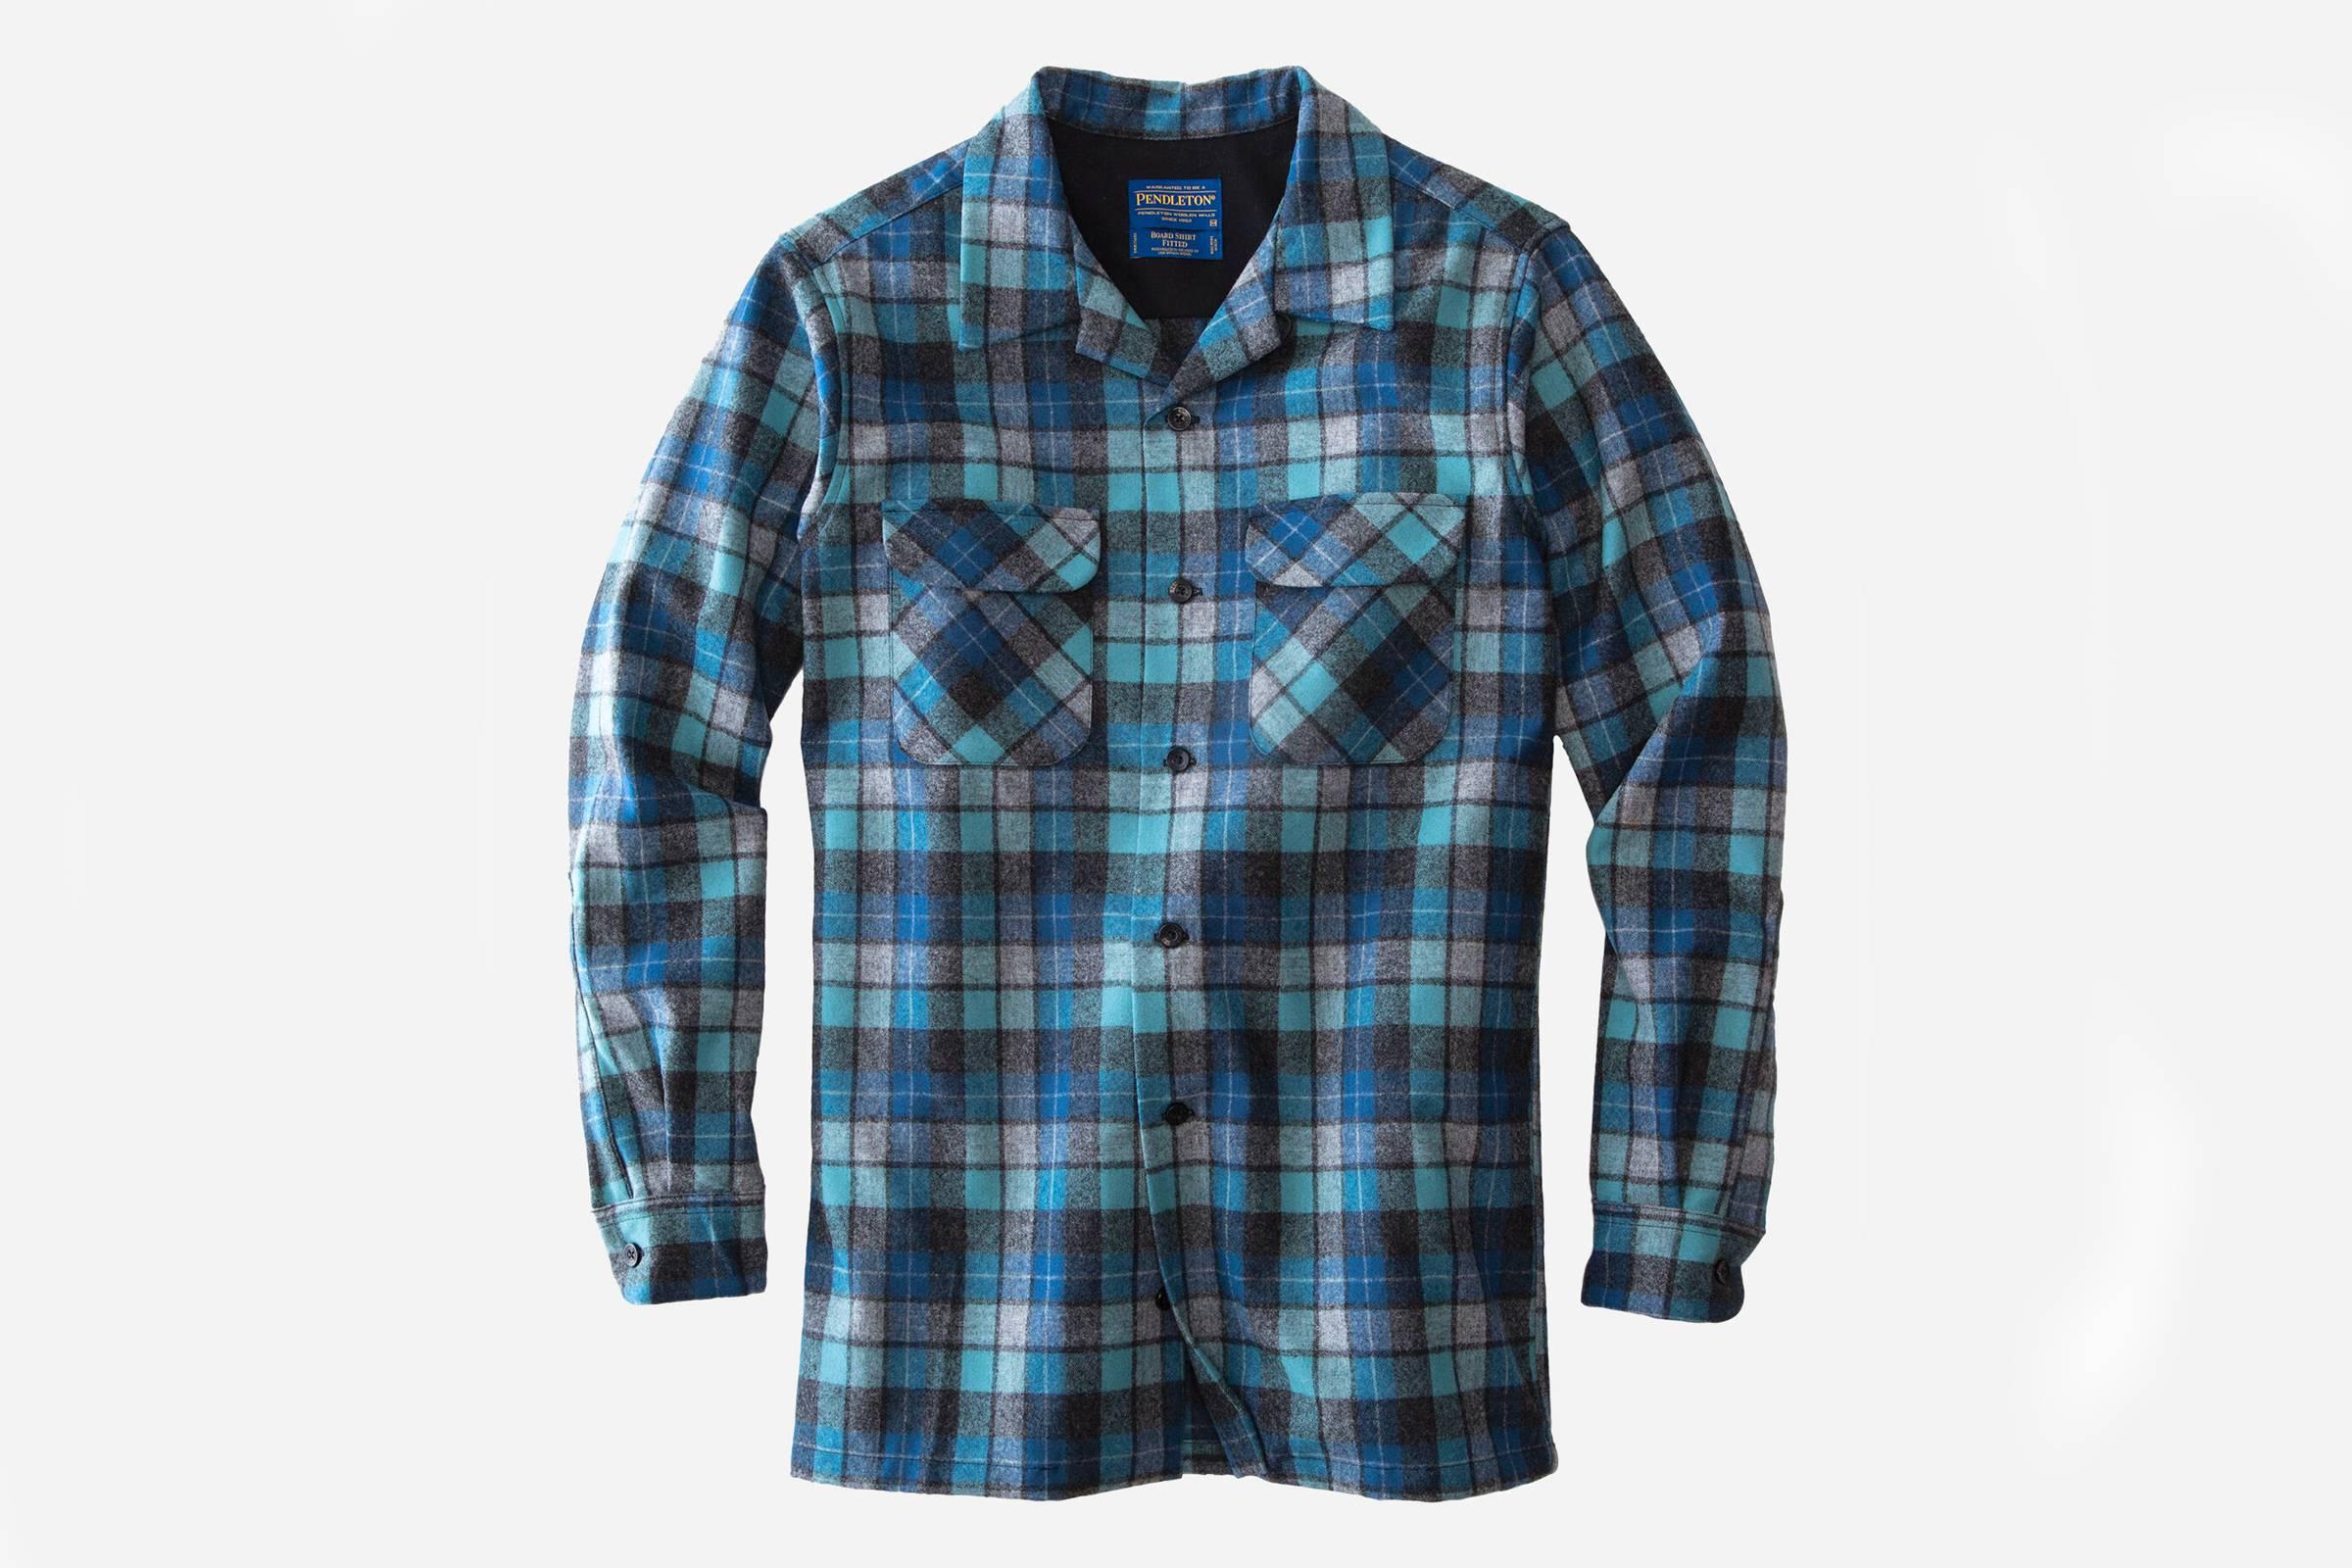 2. Pendleton Board Shirt